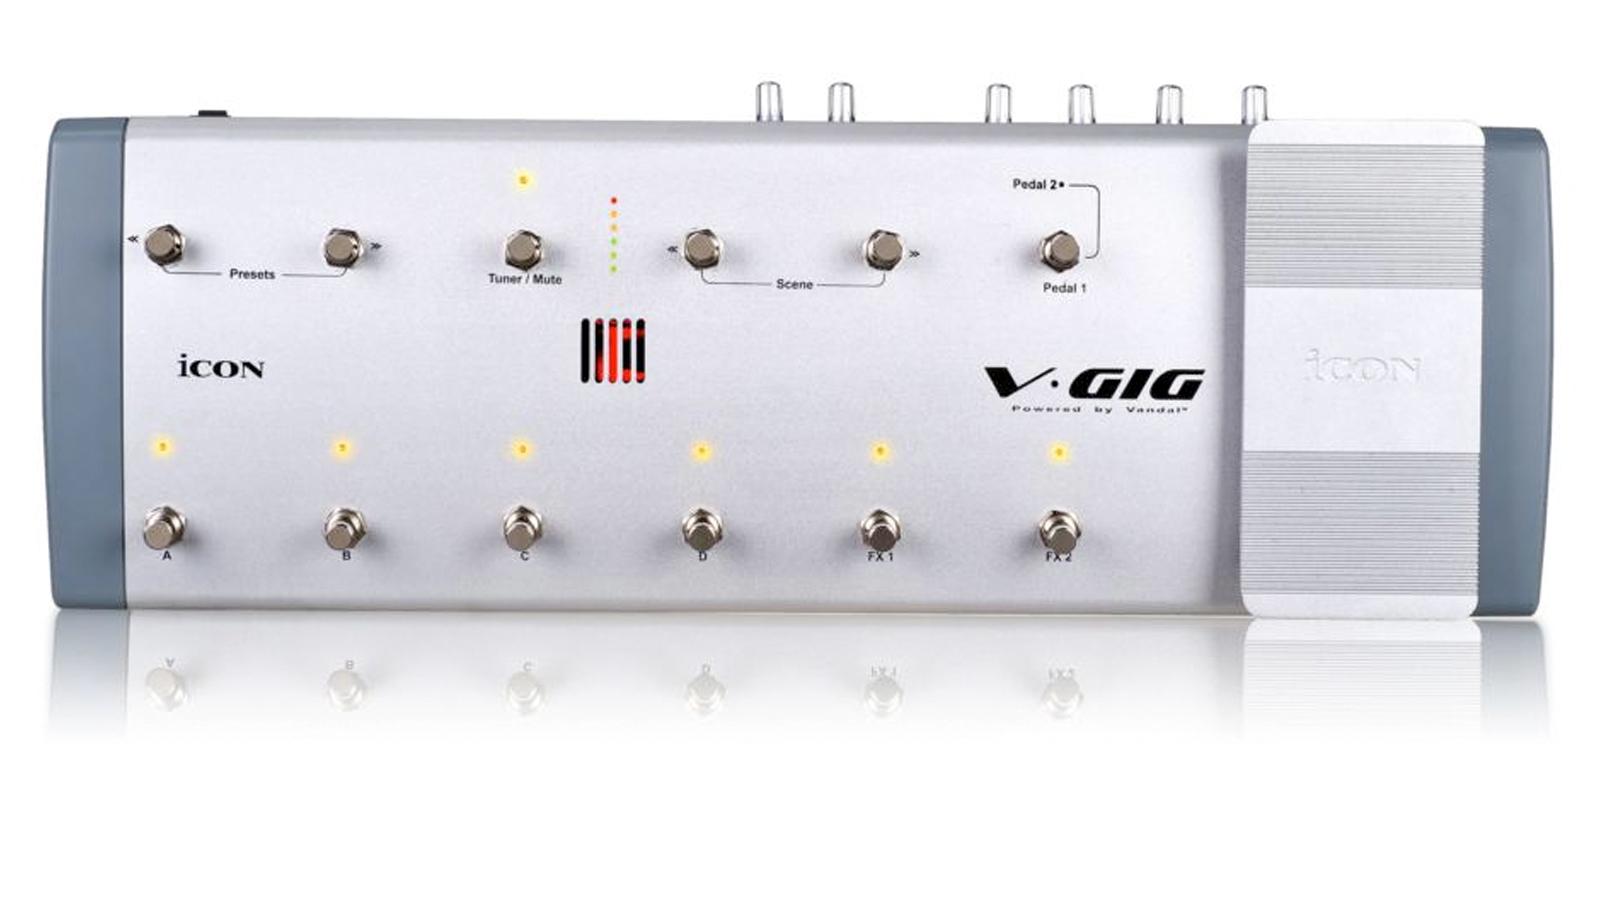 ICON V-GIG Effekt Board